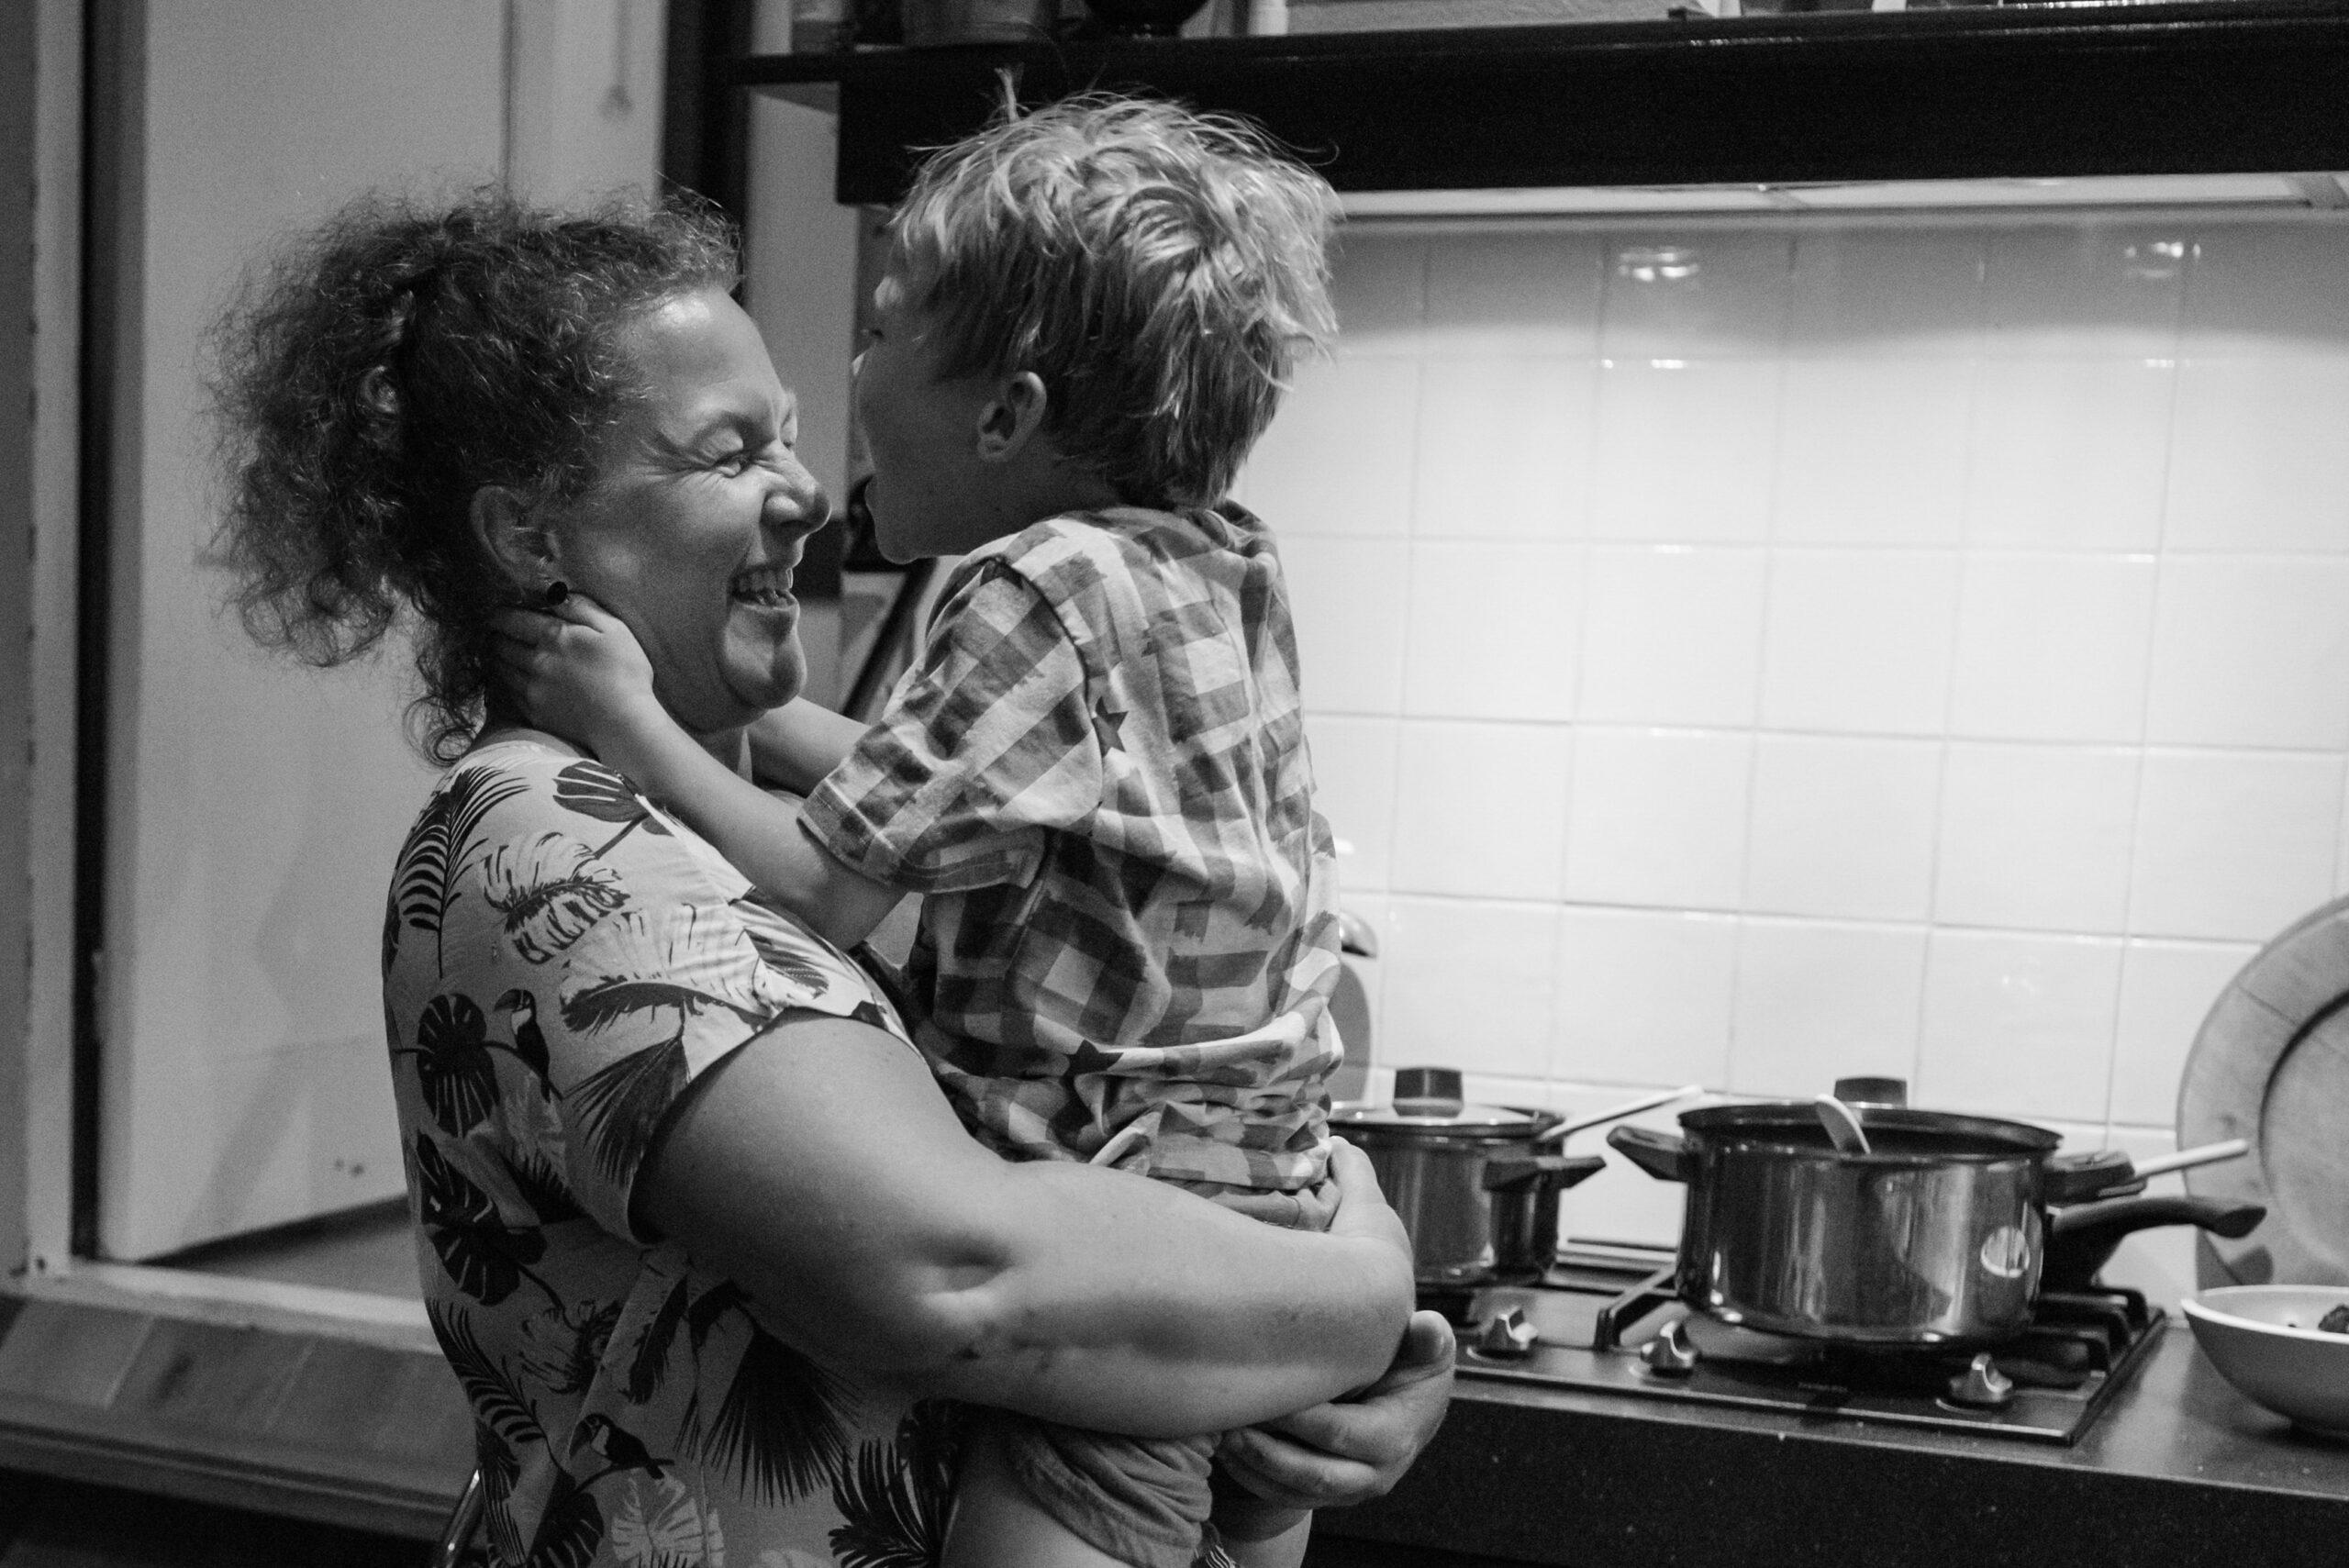 Moeder knuffelt zoon in keuken Jasja de Wit Fotografie Gezinsfotografie